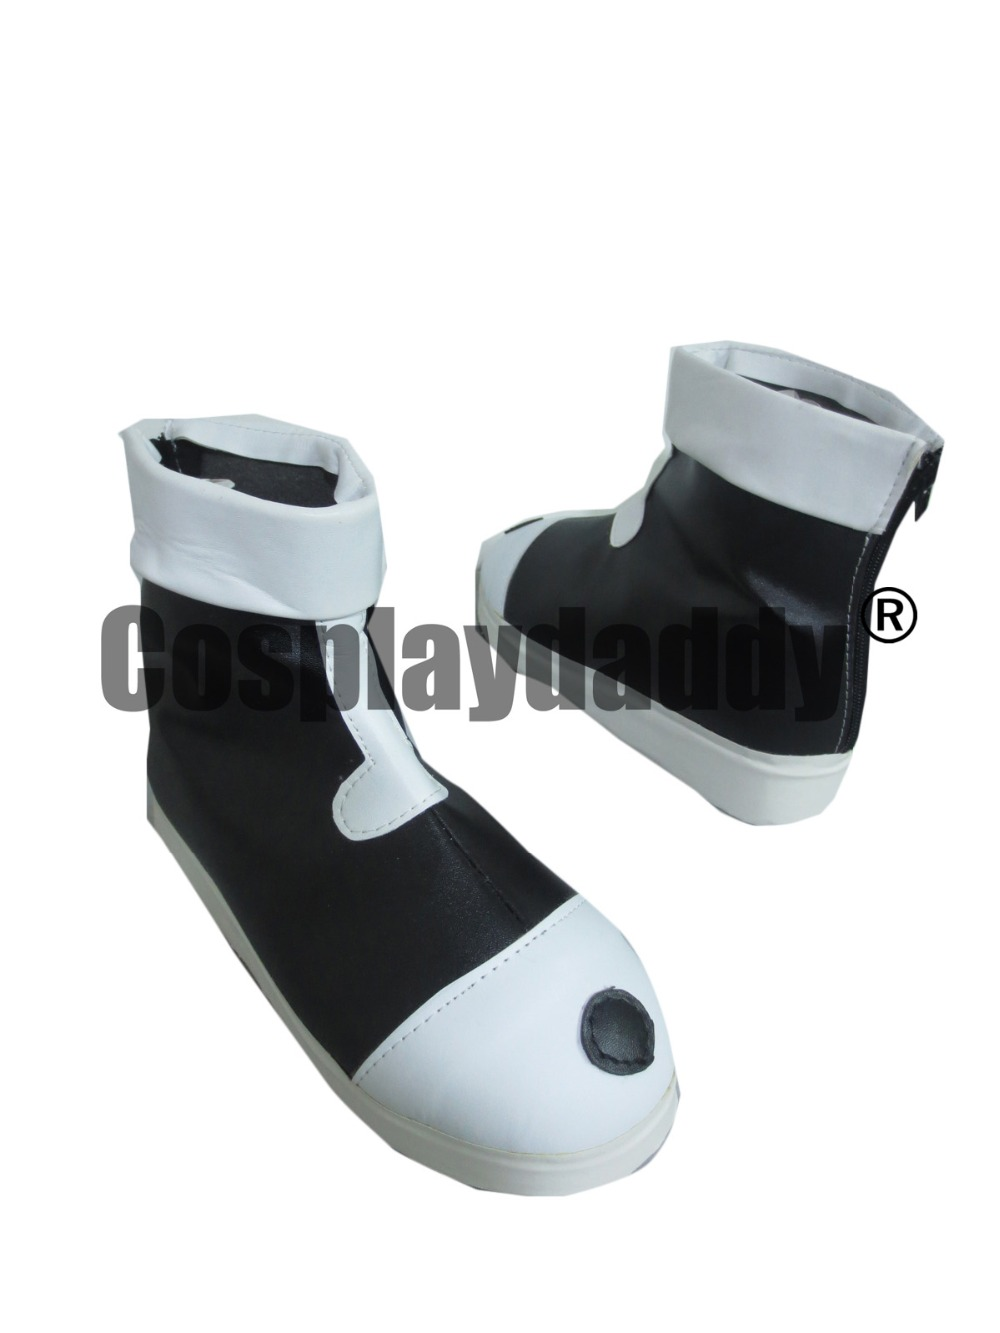 Hunter X Hunter Killua Zaoldyeck White Black boots cosplay shoes S008